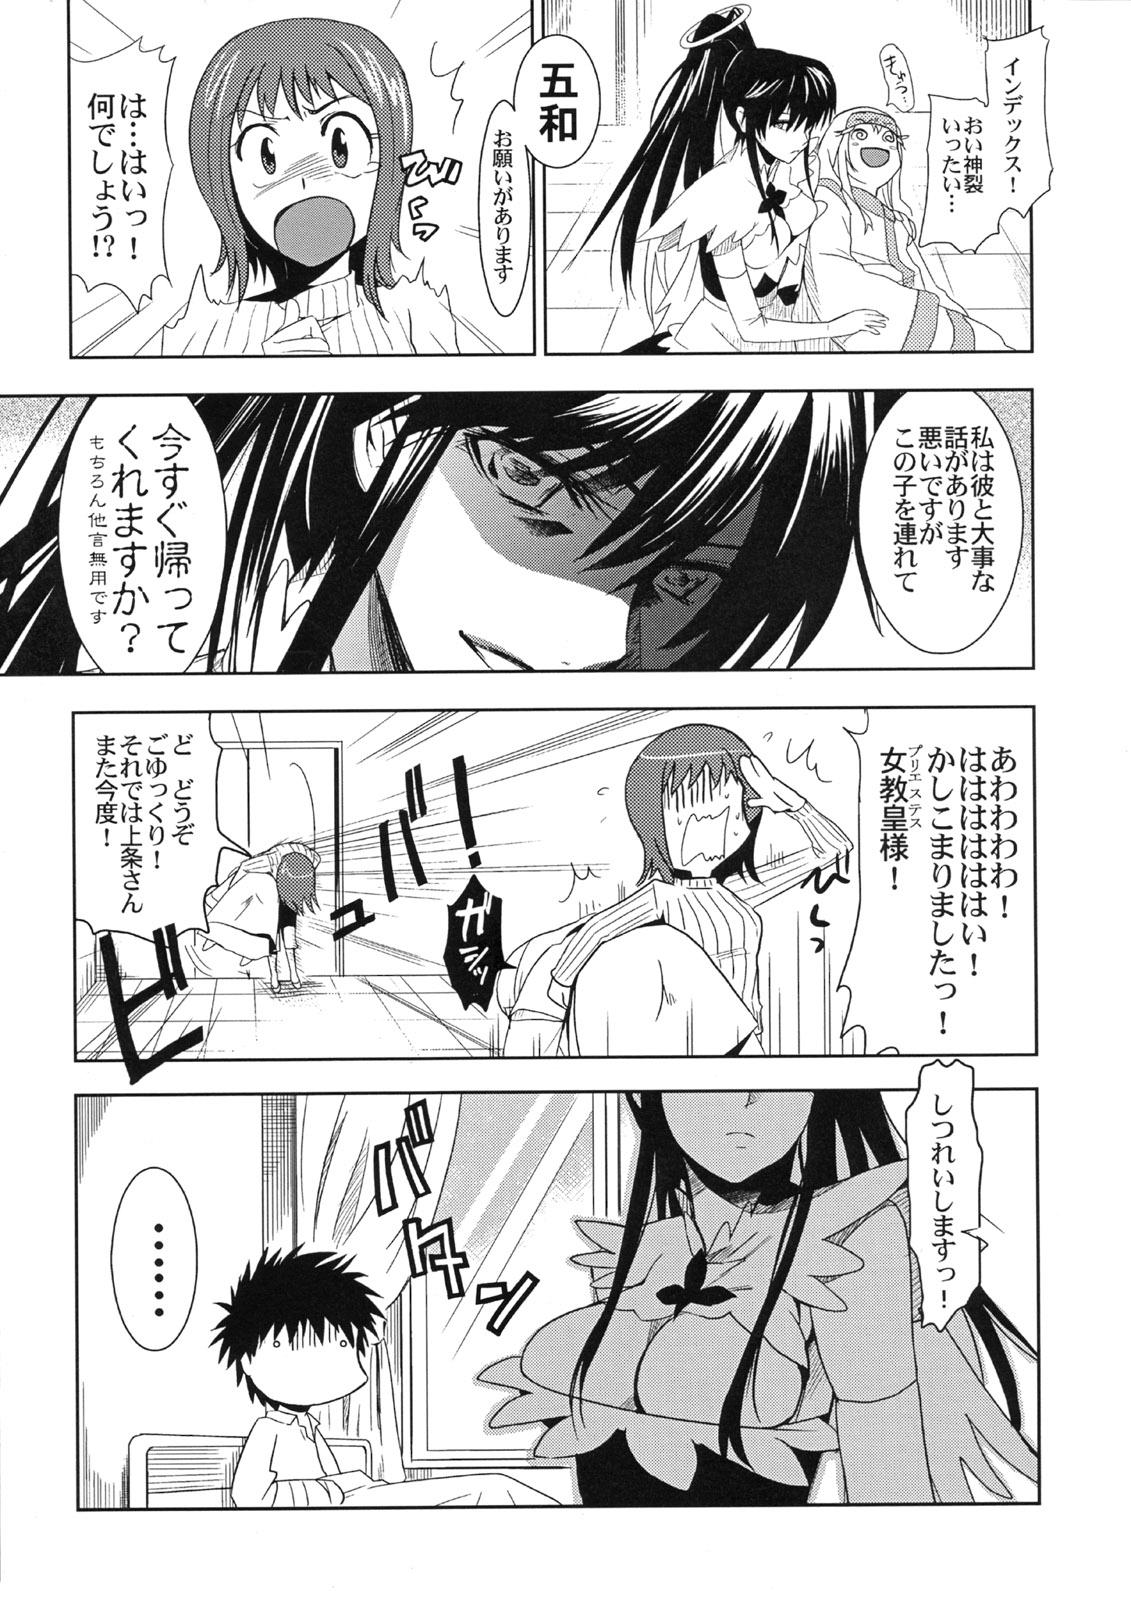 re=l koushi records to rokudenashi akashic majutsu Order of the stick miko